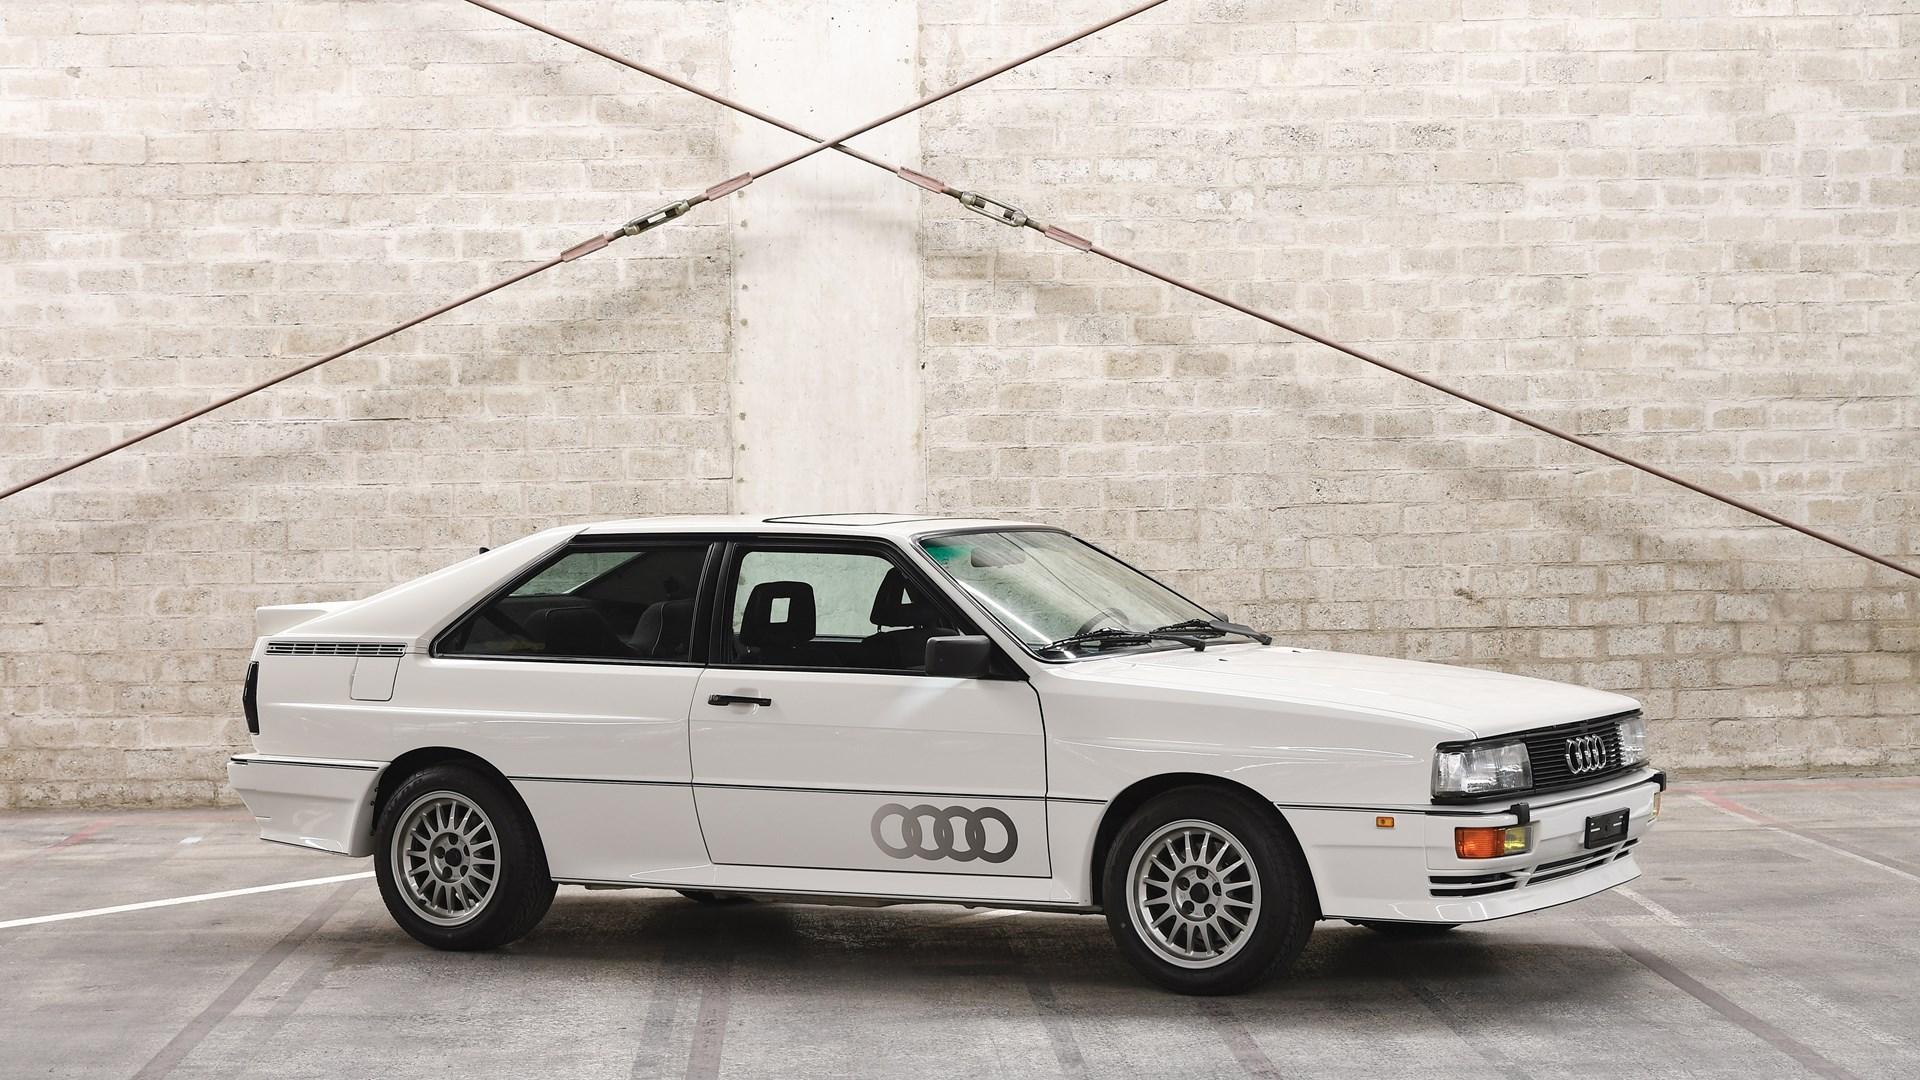 Kelebihan Kekurangan Audi Quattro 1985 Murah Berkualitas